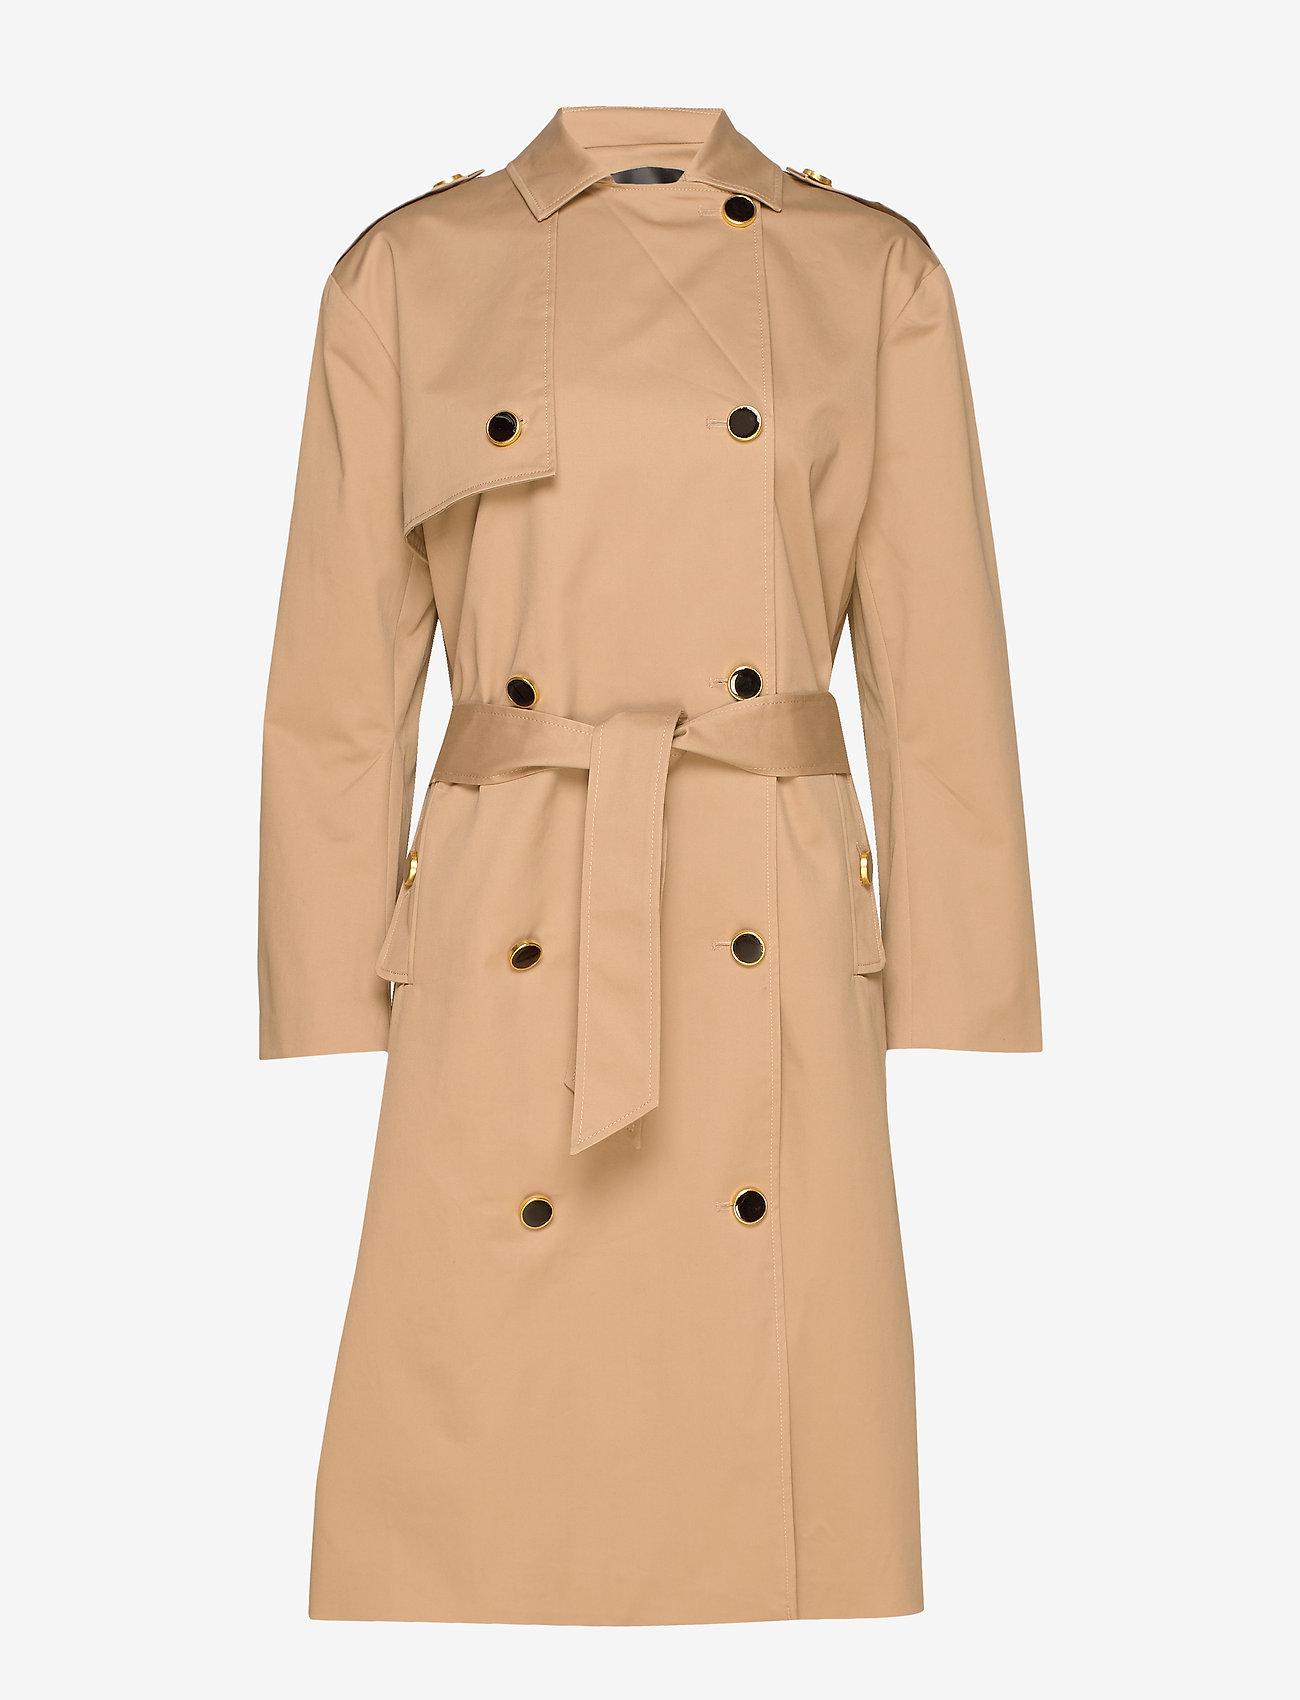 Stella Nova Eza - Jackets & Coats